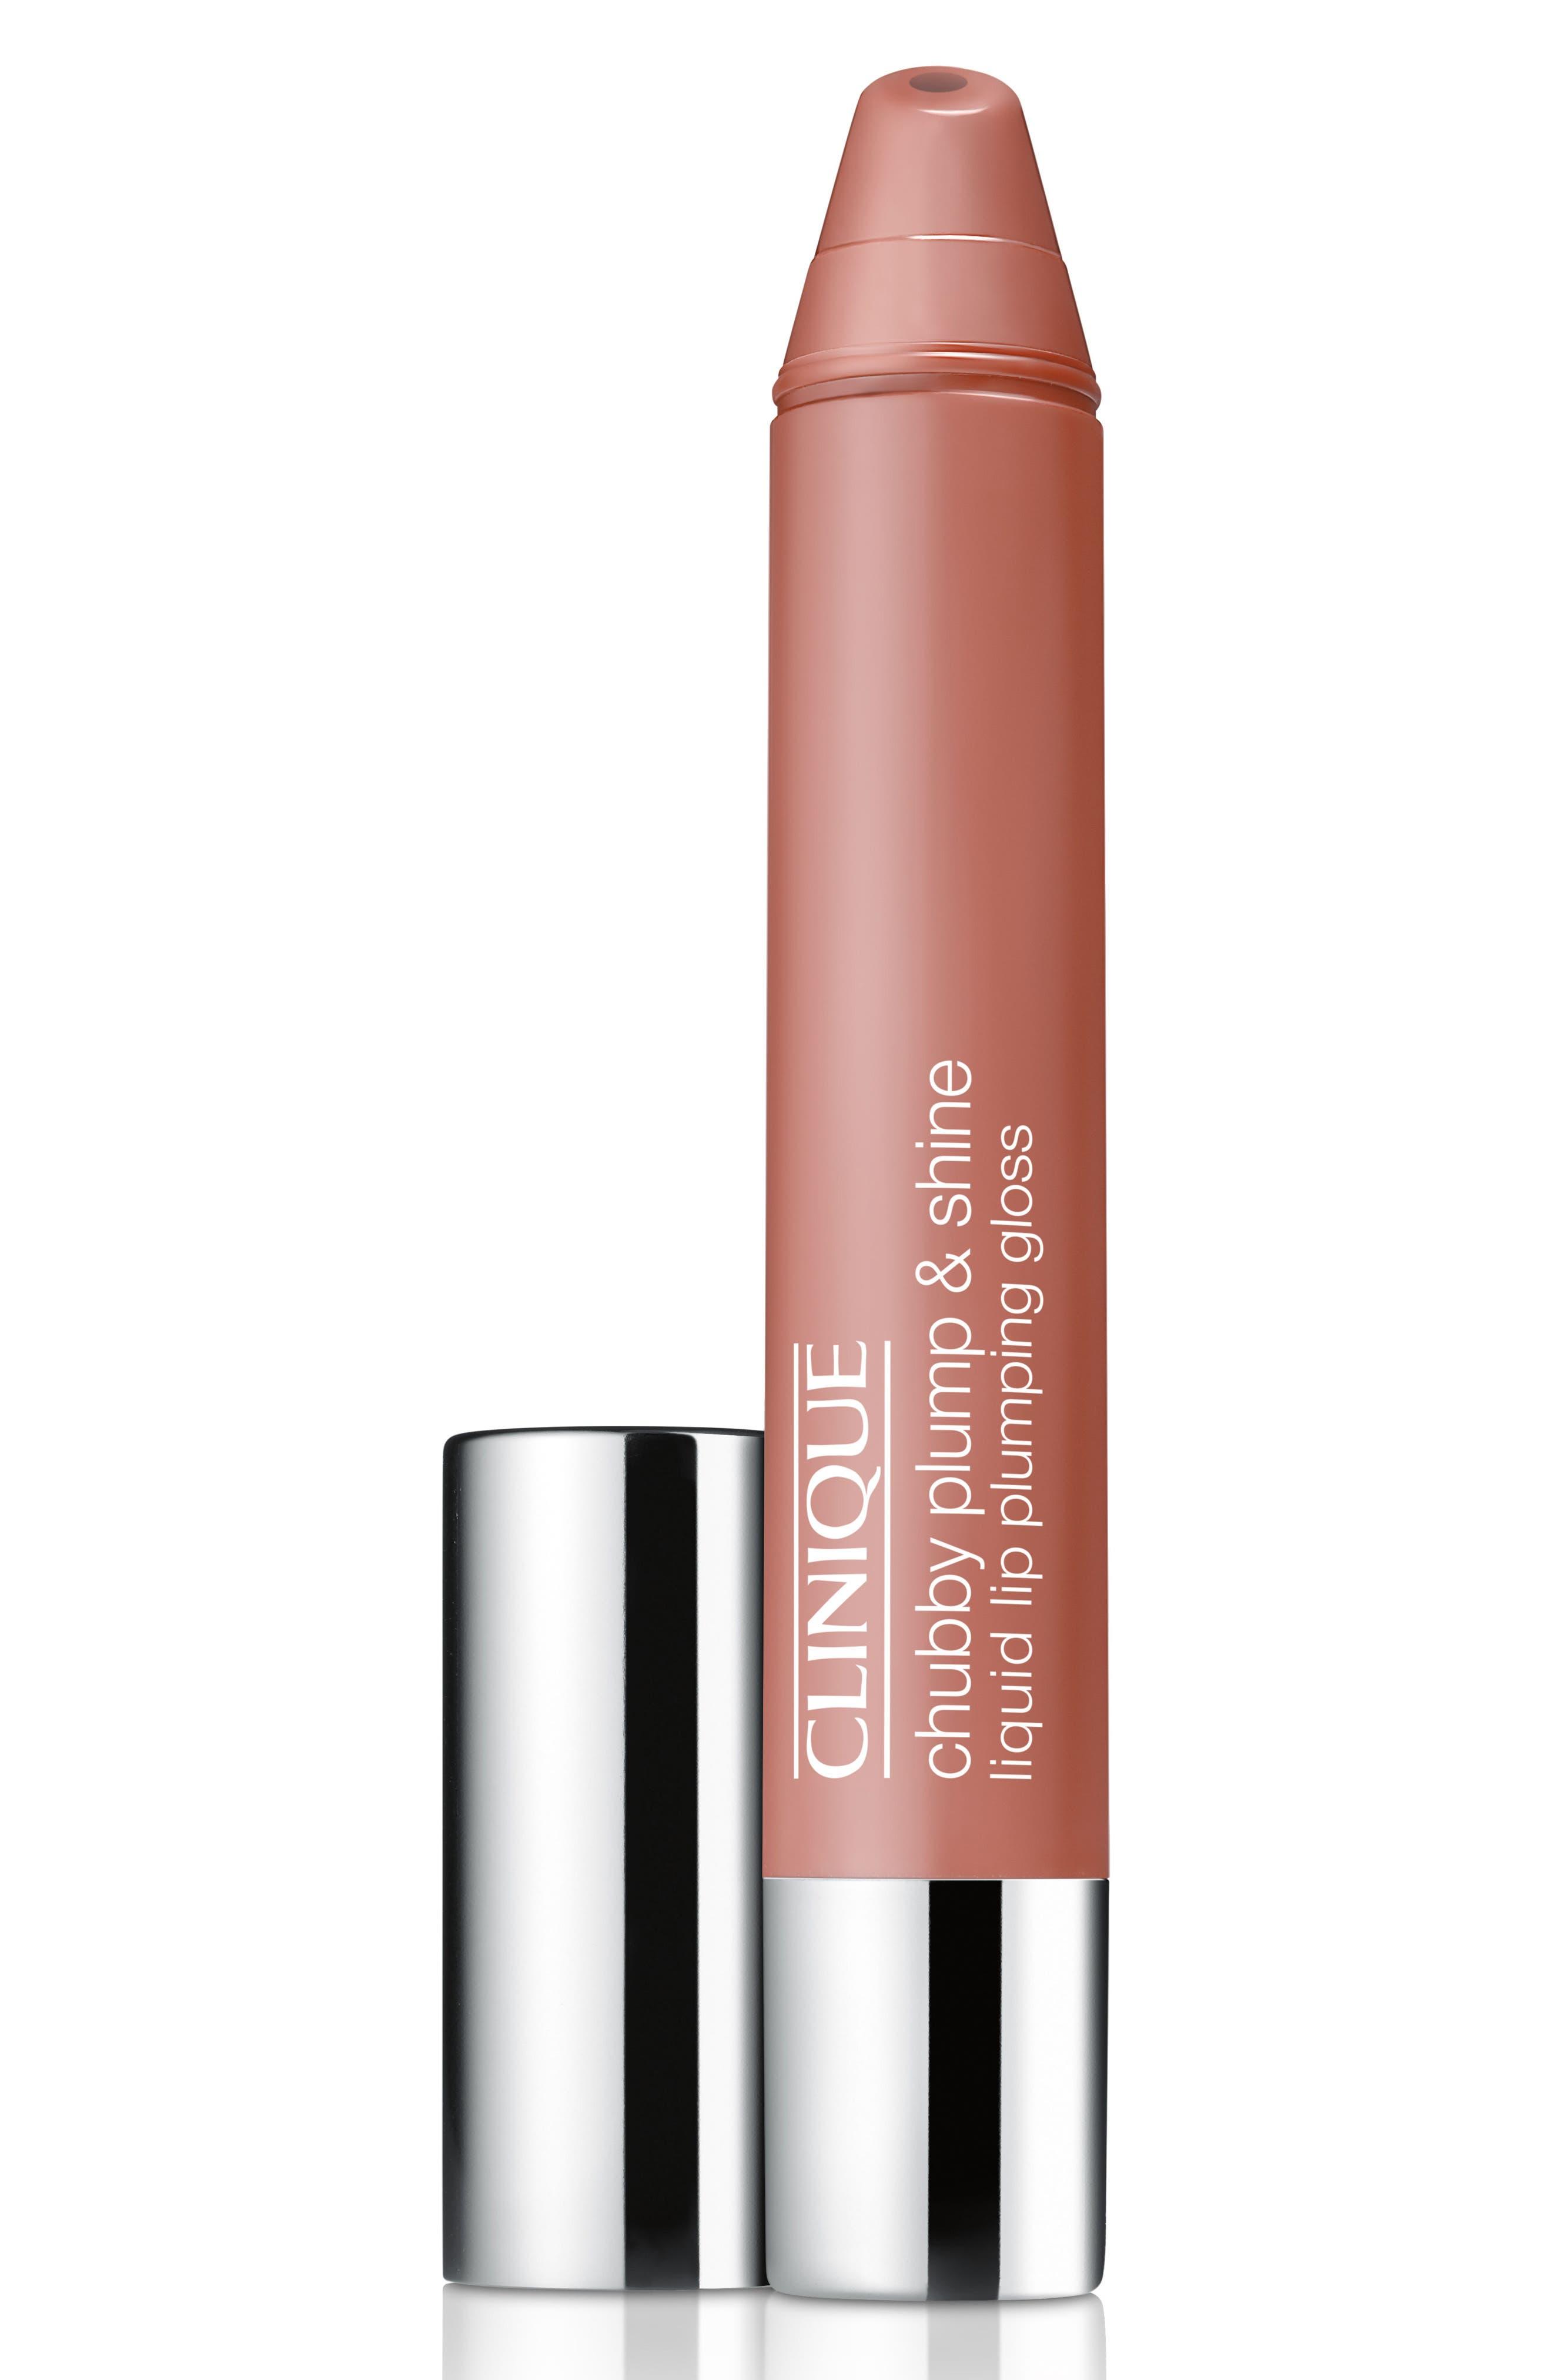 Chubby Plump & Shine Liquid Lip Plumping Gloss,                             Main thumbnail 1, color,                             250